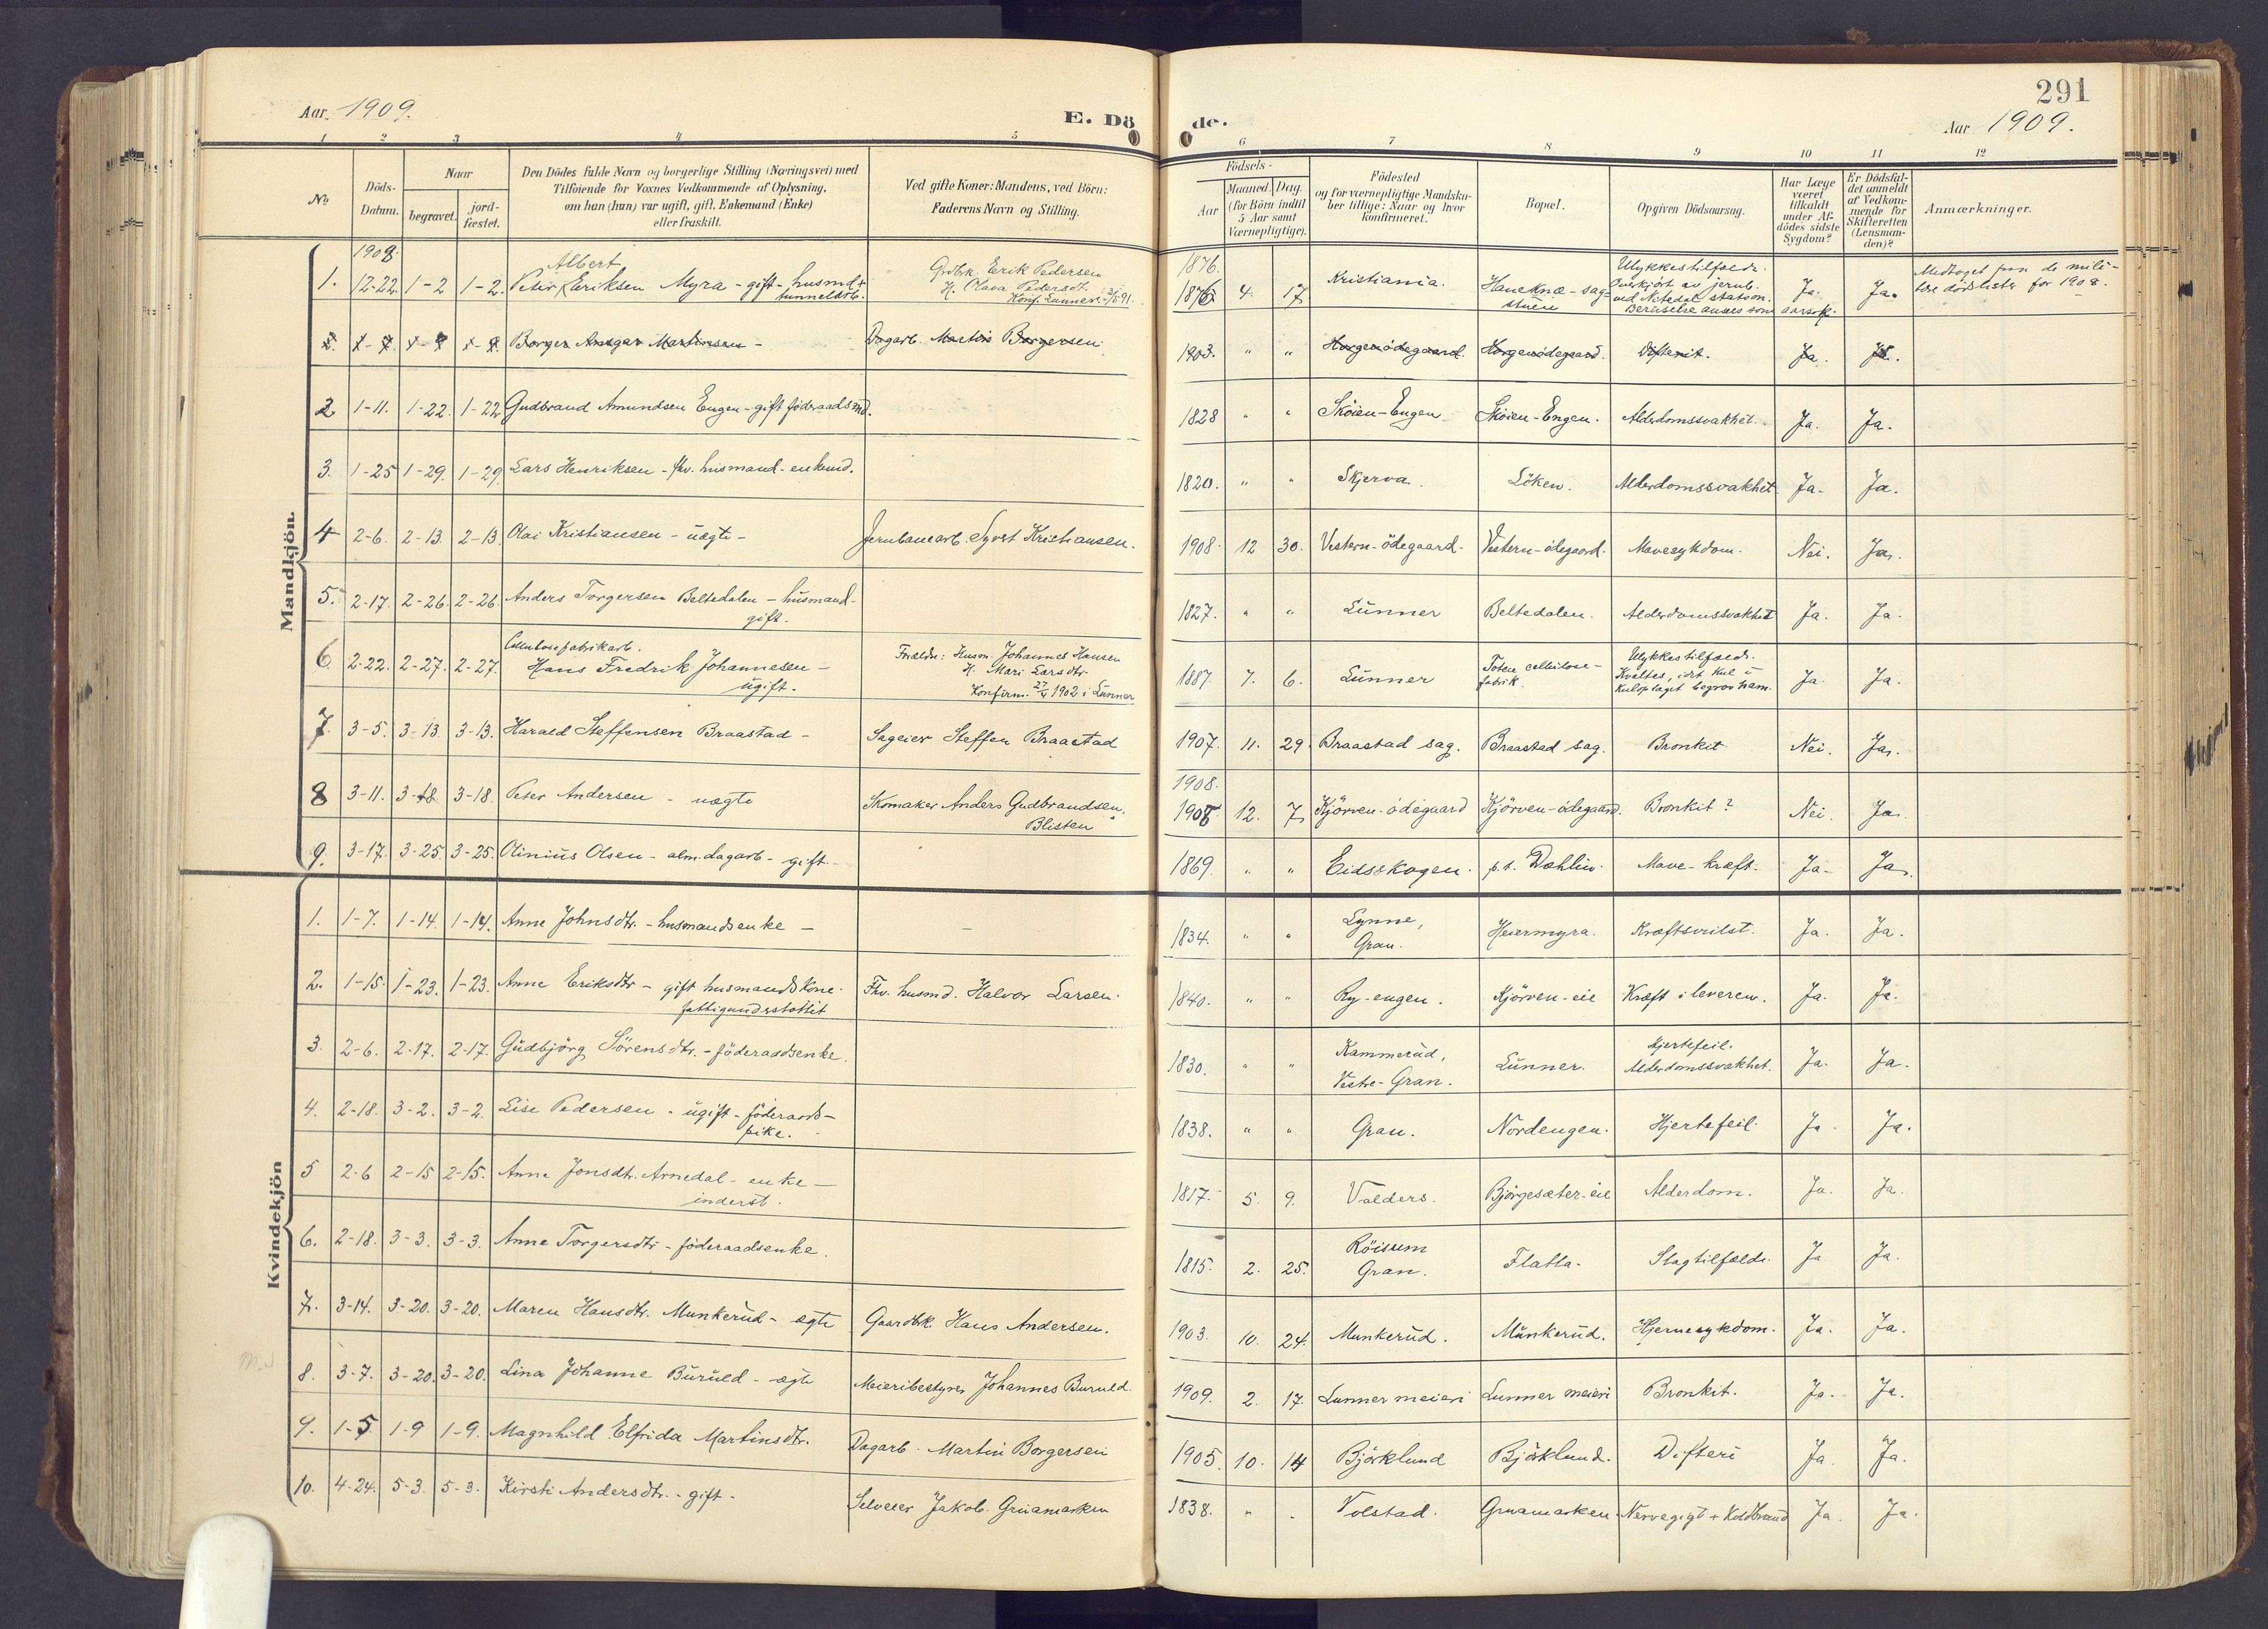 SAH, Lunner prestekontor, H/Ha/Haa/L0001: Ministerialbok nr. 1, 1907-1922, s. 291